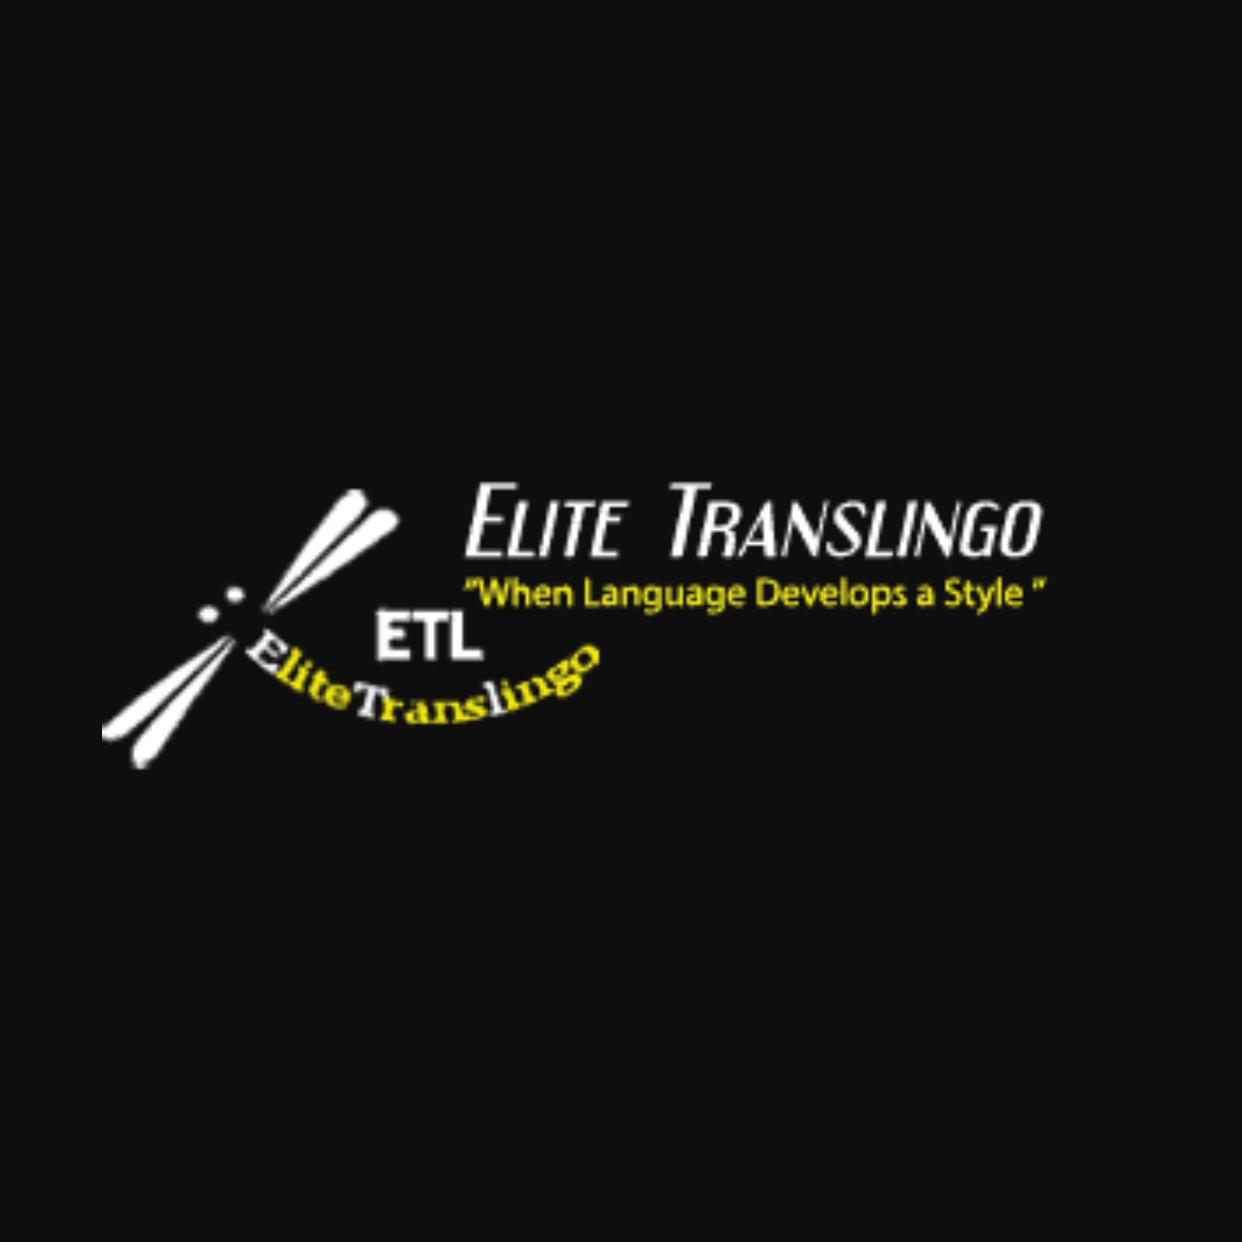 EliteTransLingo logo